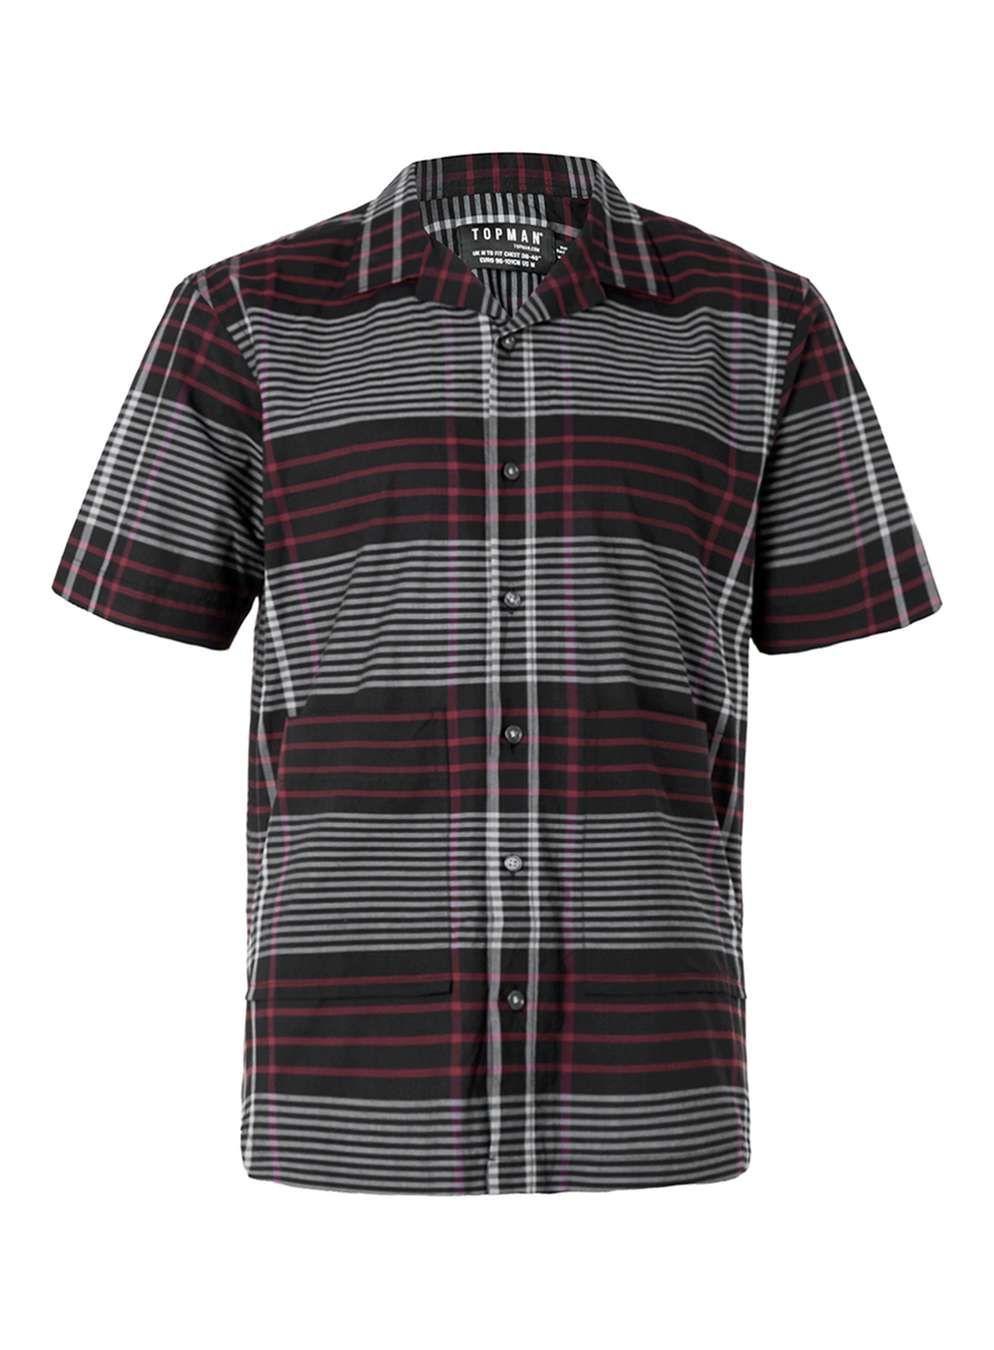 Black grey and red check short sleeve smart shirt